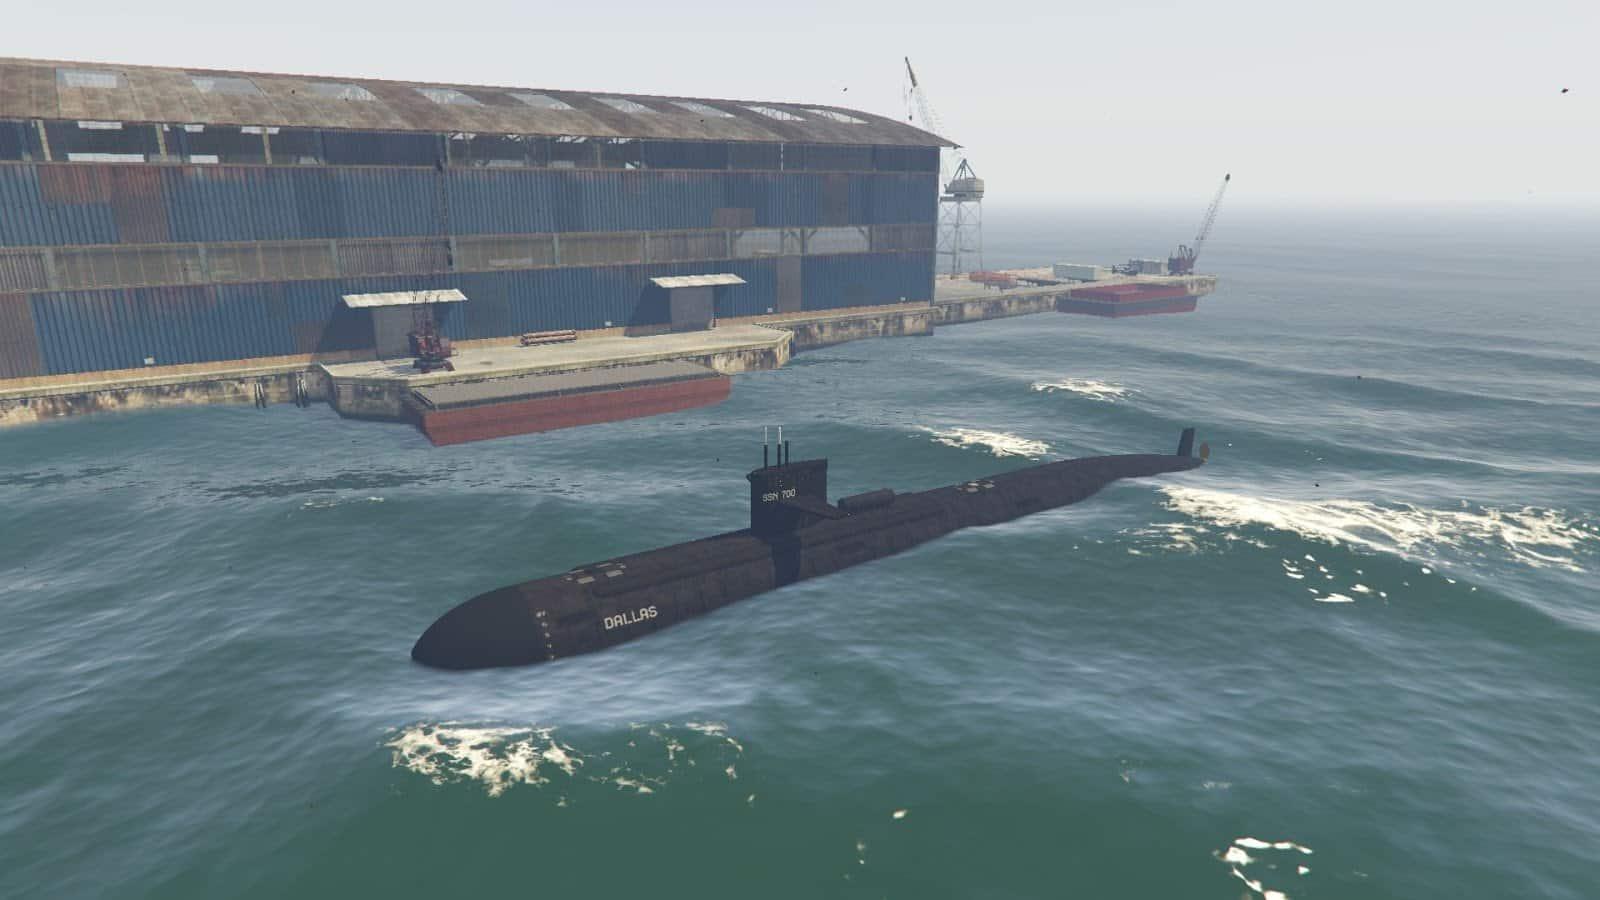 GTA V Gets Military Submarine And Boat (Mod) - GTA BOOM